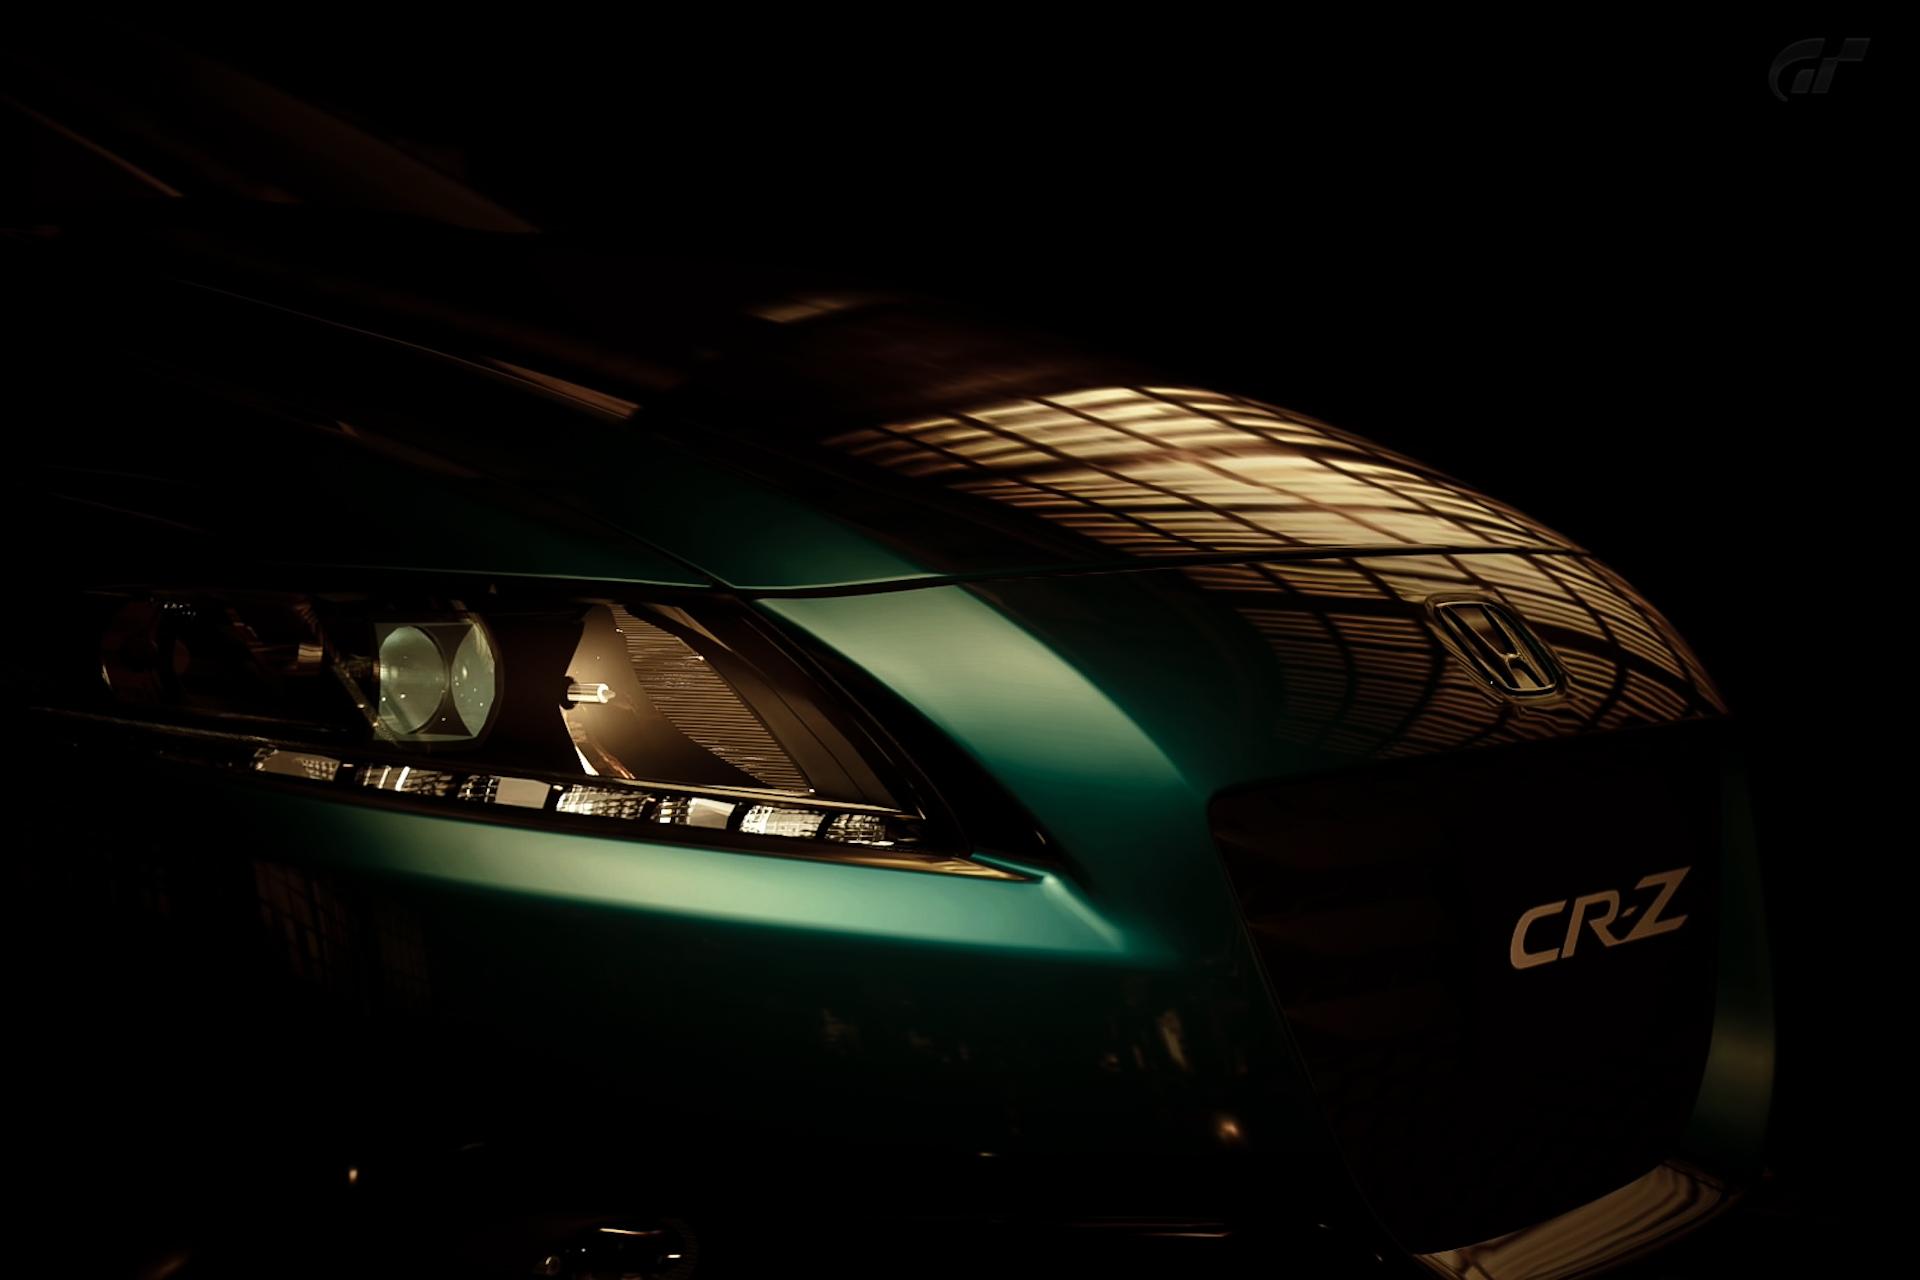 Gran Turismo 5 Photomode by dReam-Vii